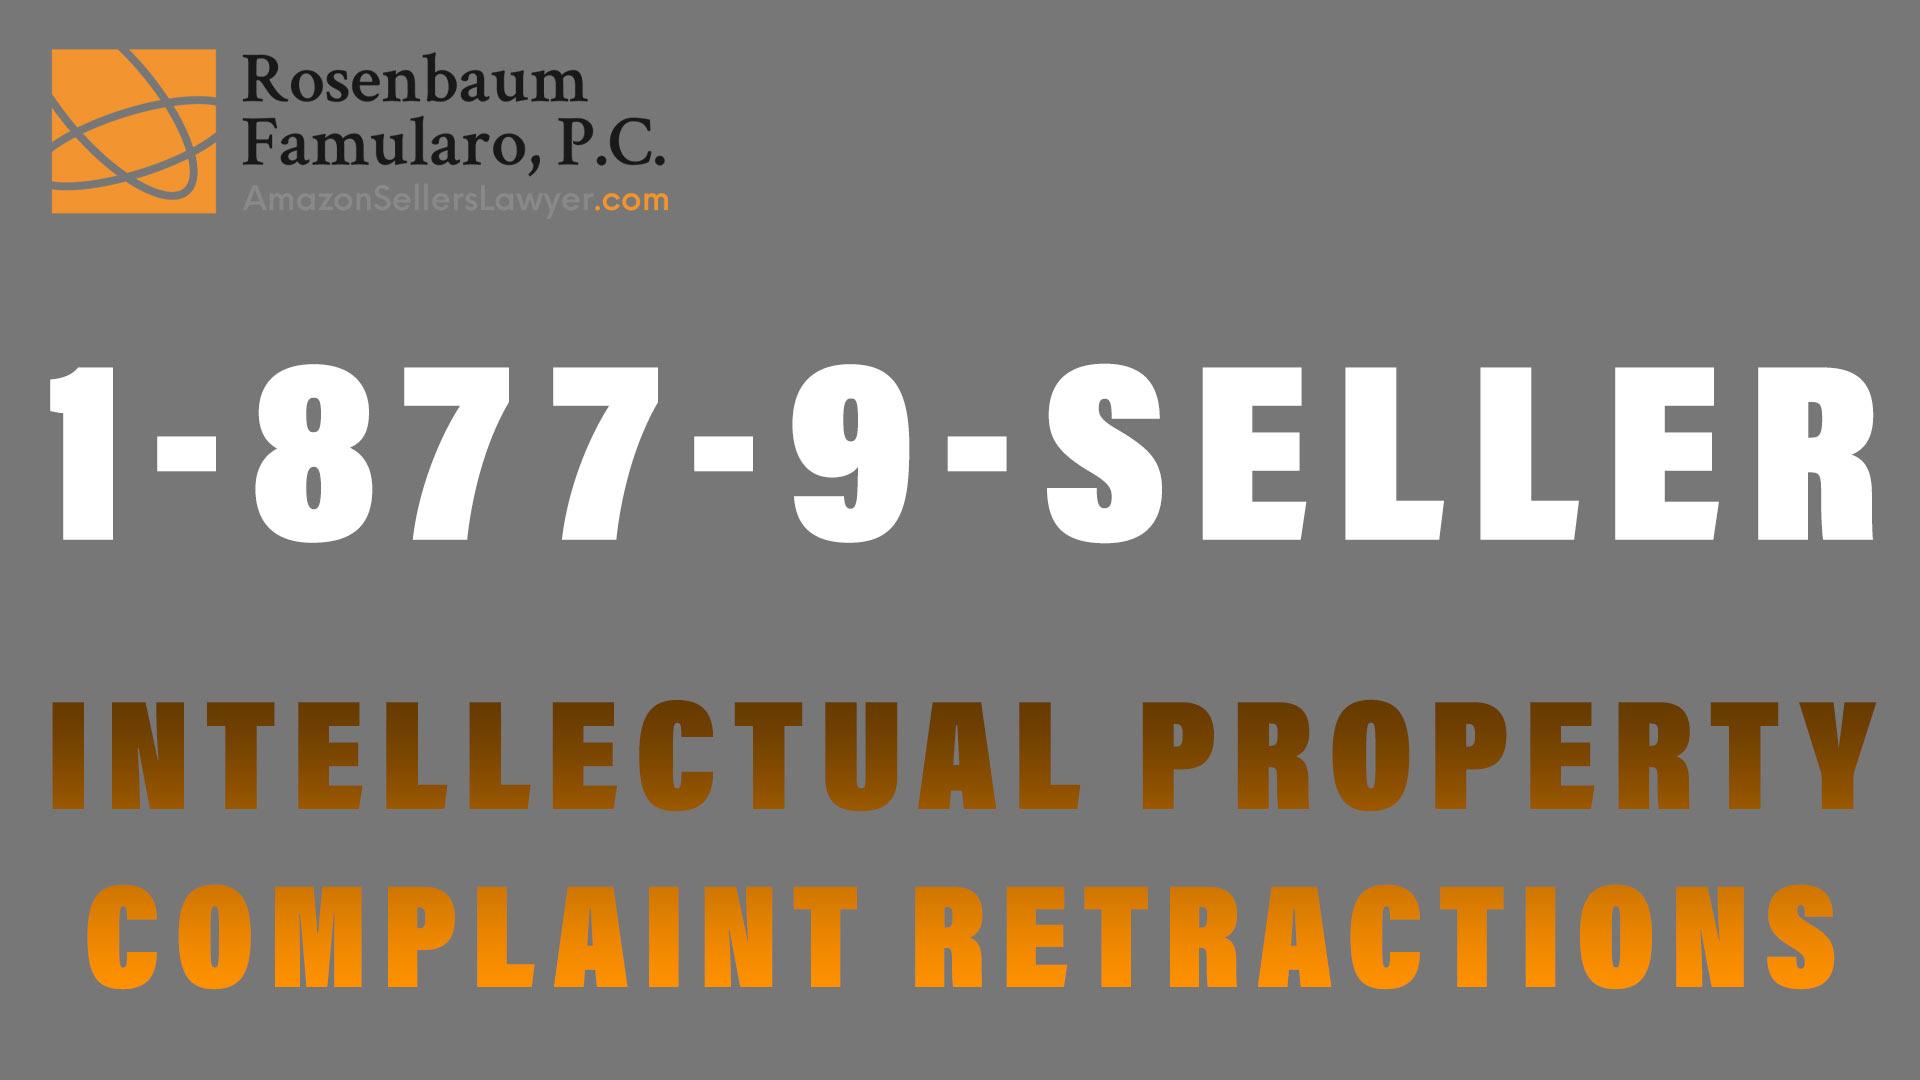 Intellectual Property Complaint Retractions - design patent infringement